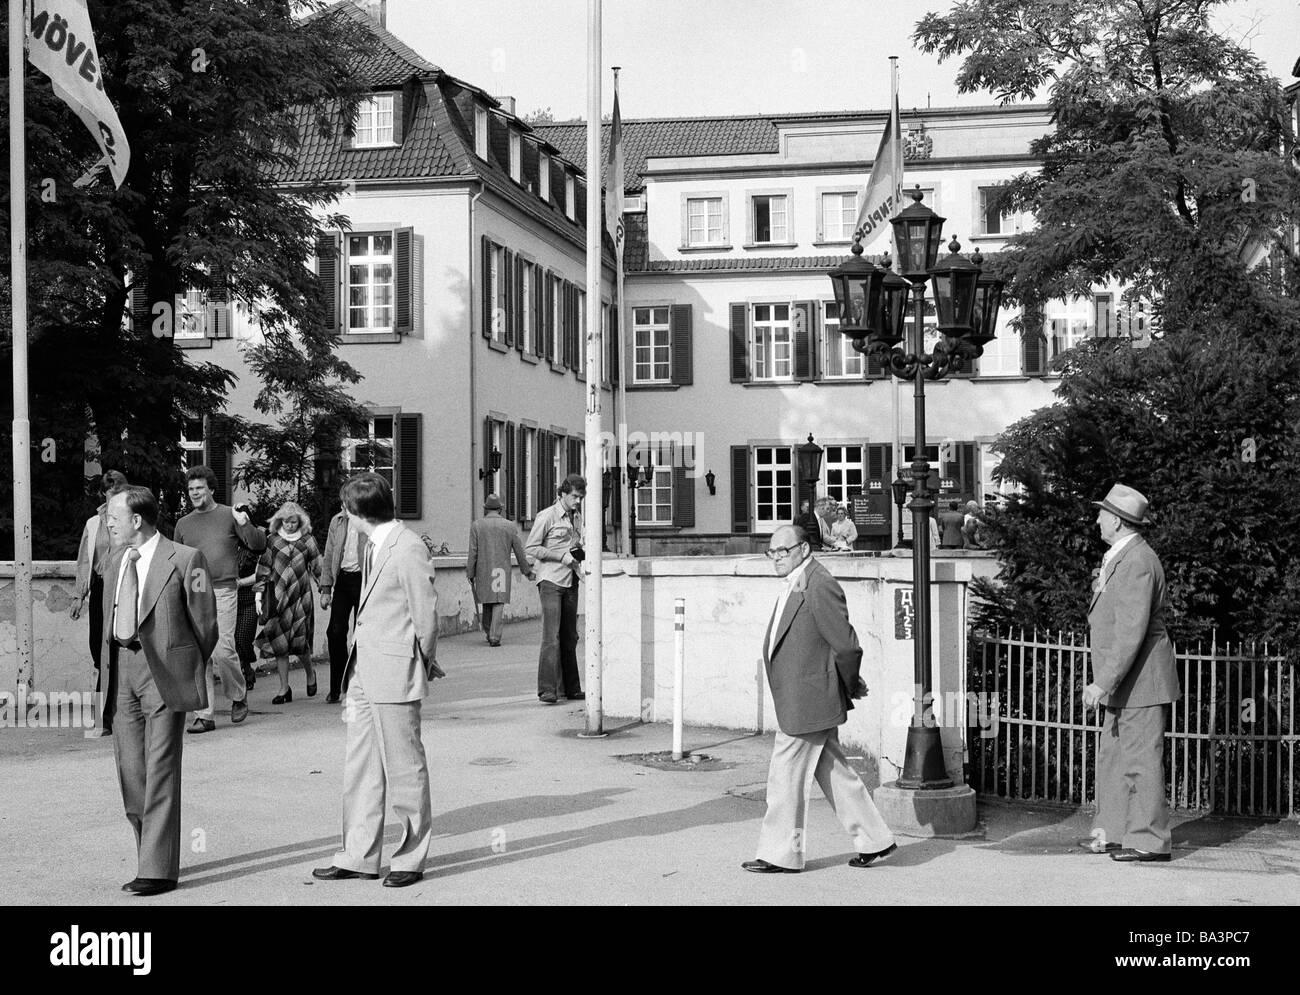 Siebziger Jahre, Tourismus, Menschen am Schloss Berge, Wasserschloss, Gelsenkirchen-Buer, Ruhrgebiet, Nordrhein - Stock Image